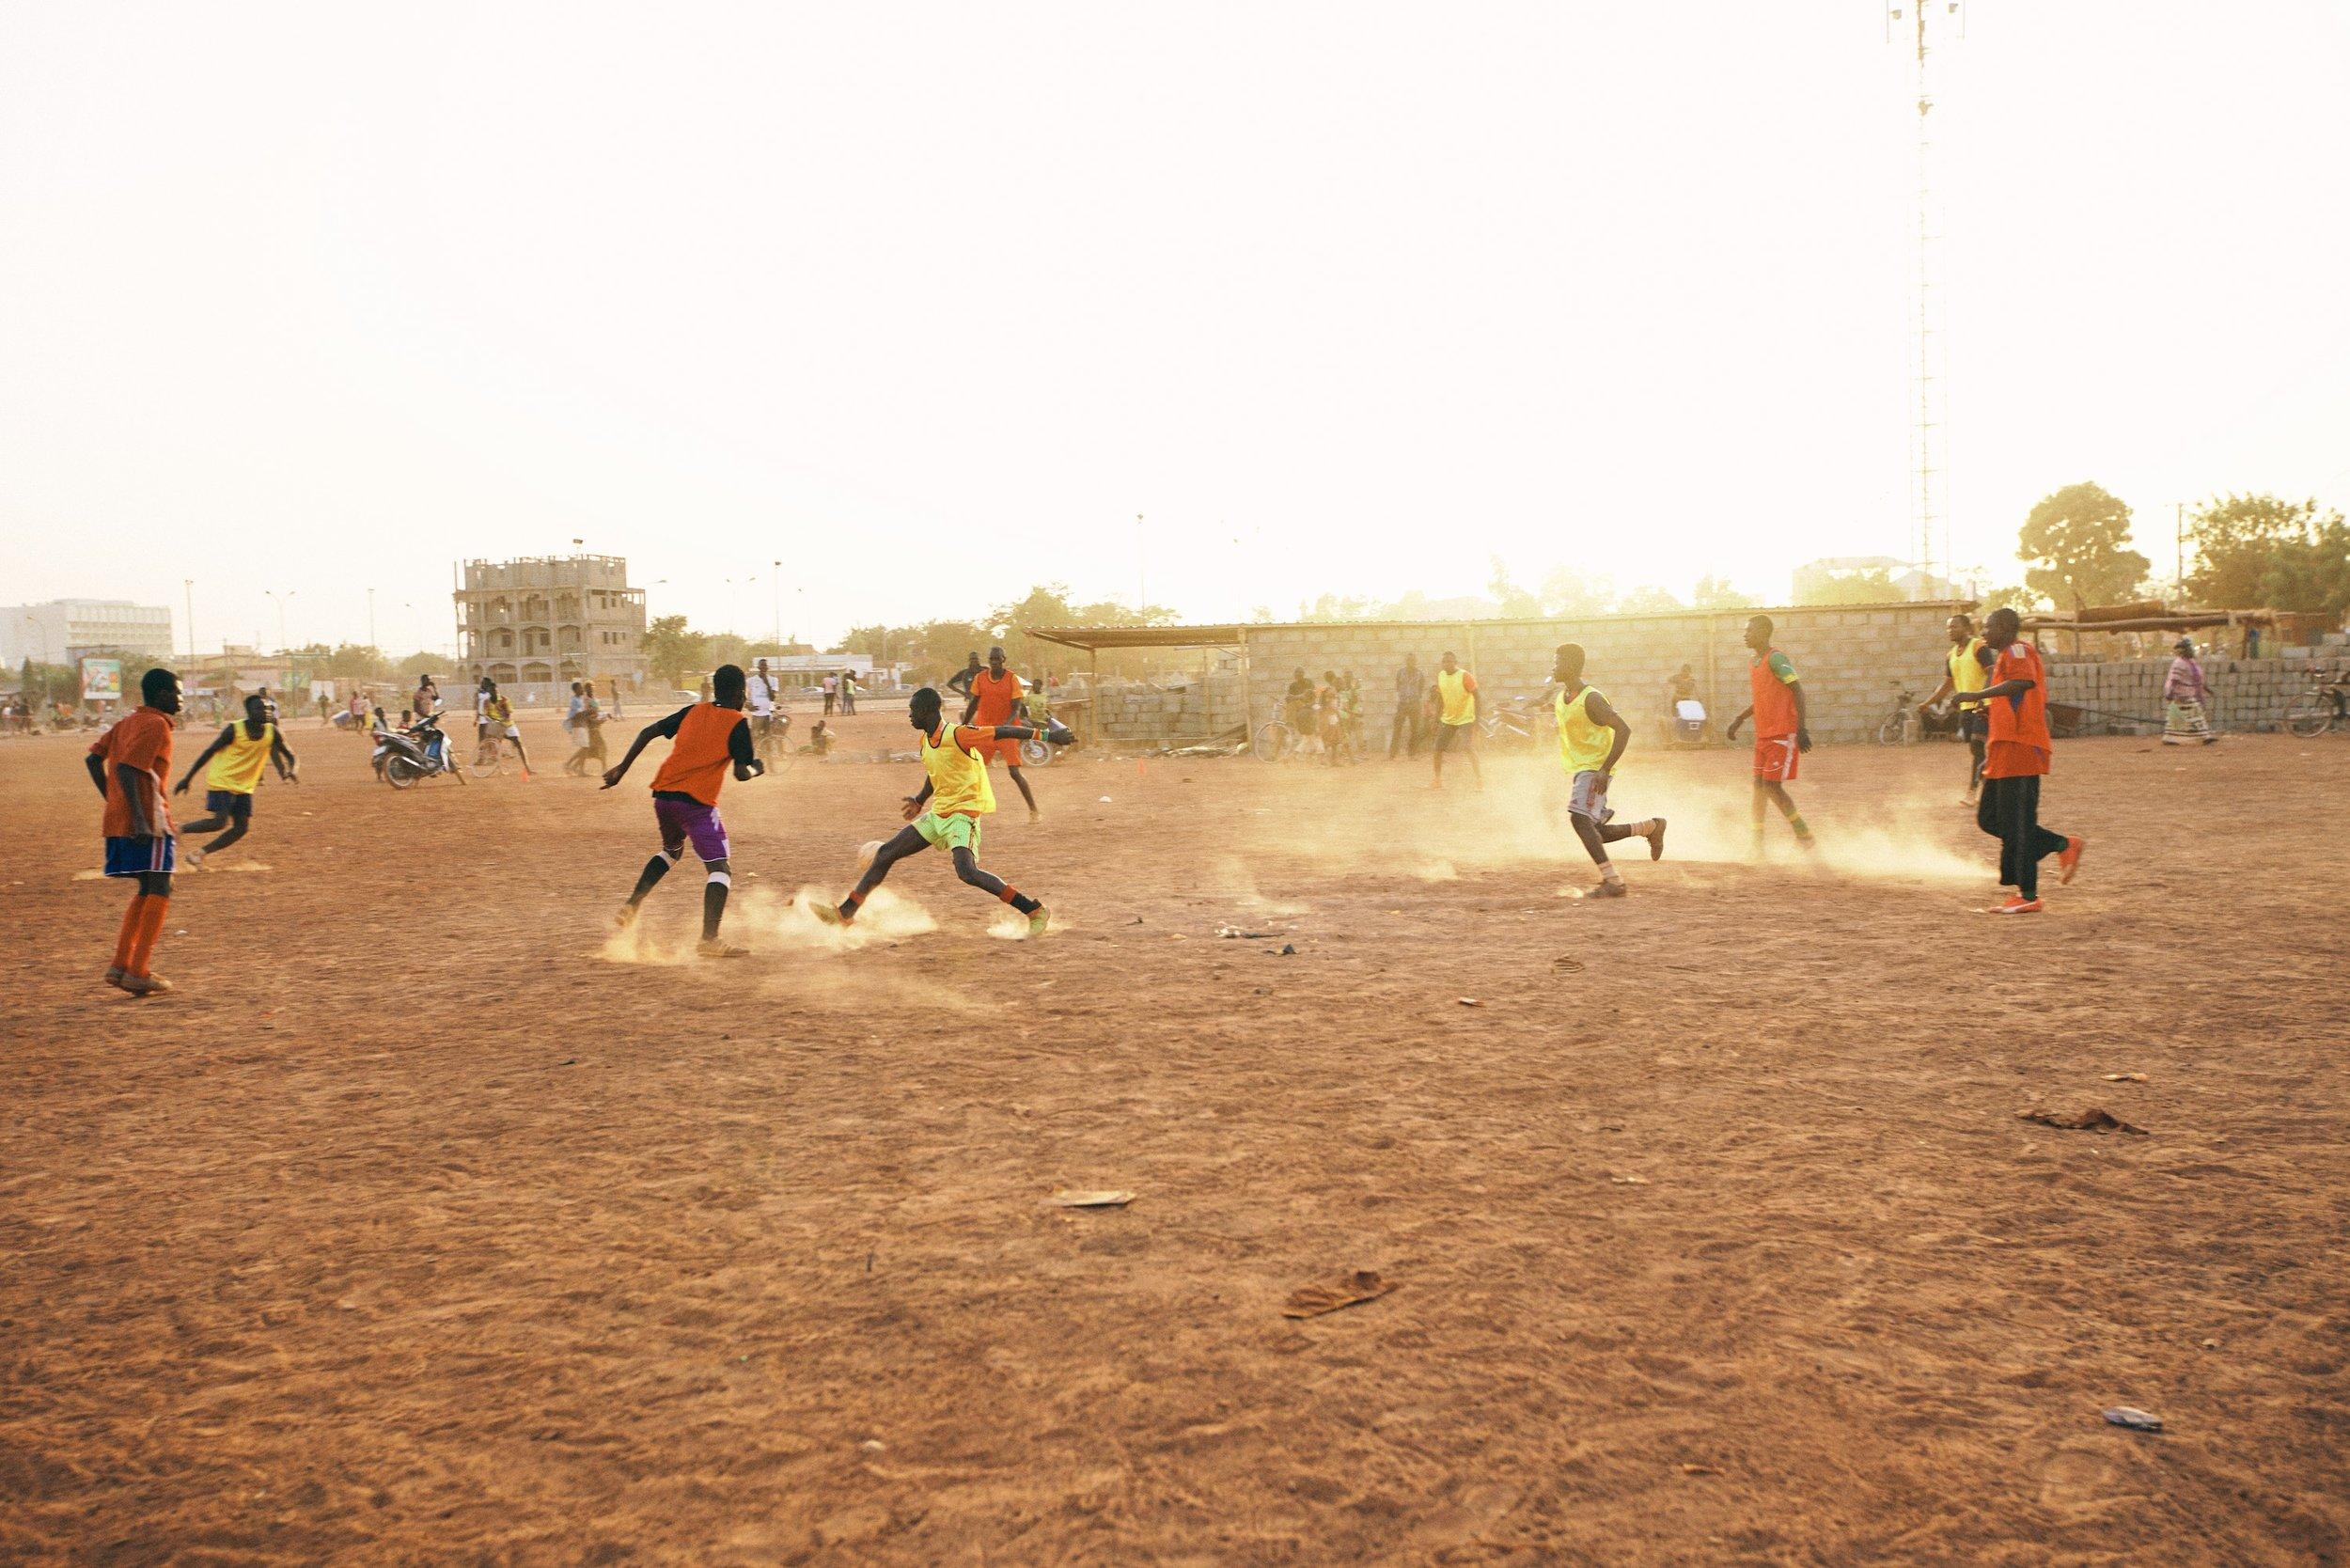 Stockdale_Ouagadougou22.jpg